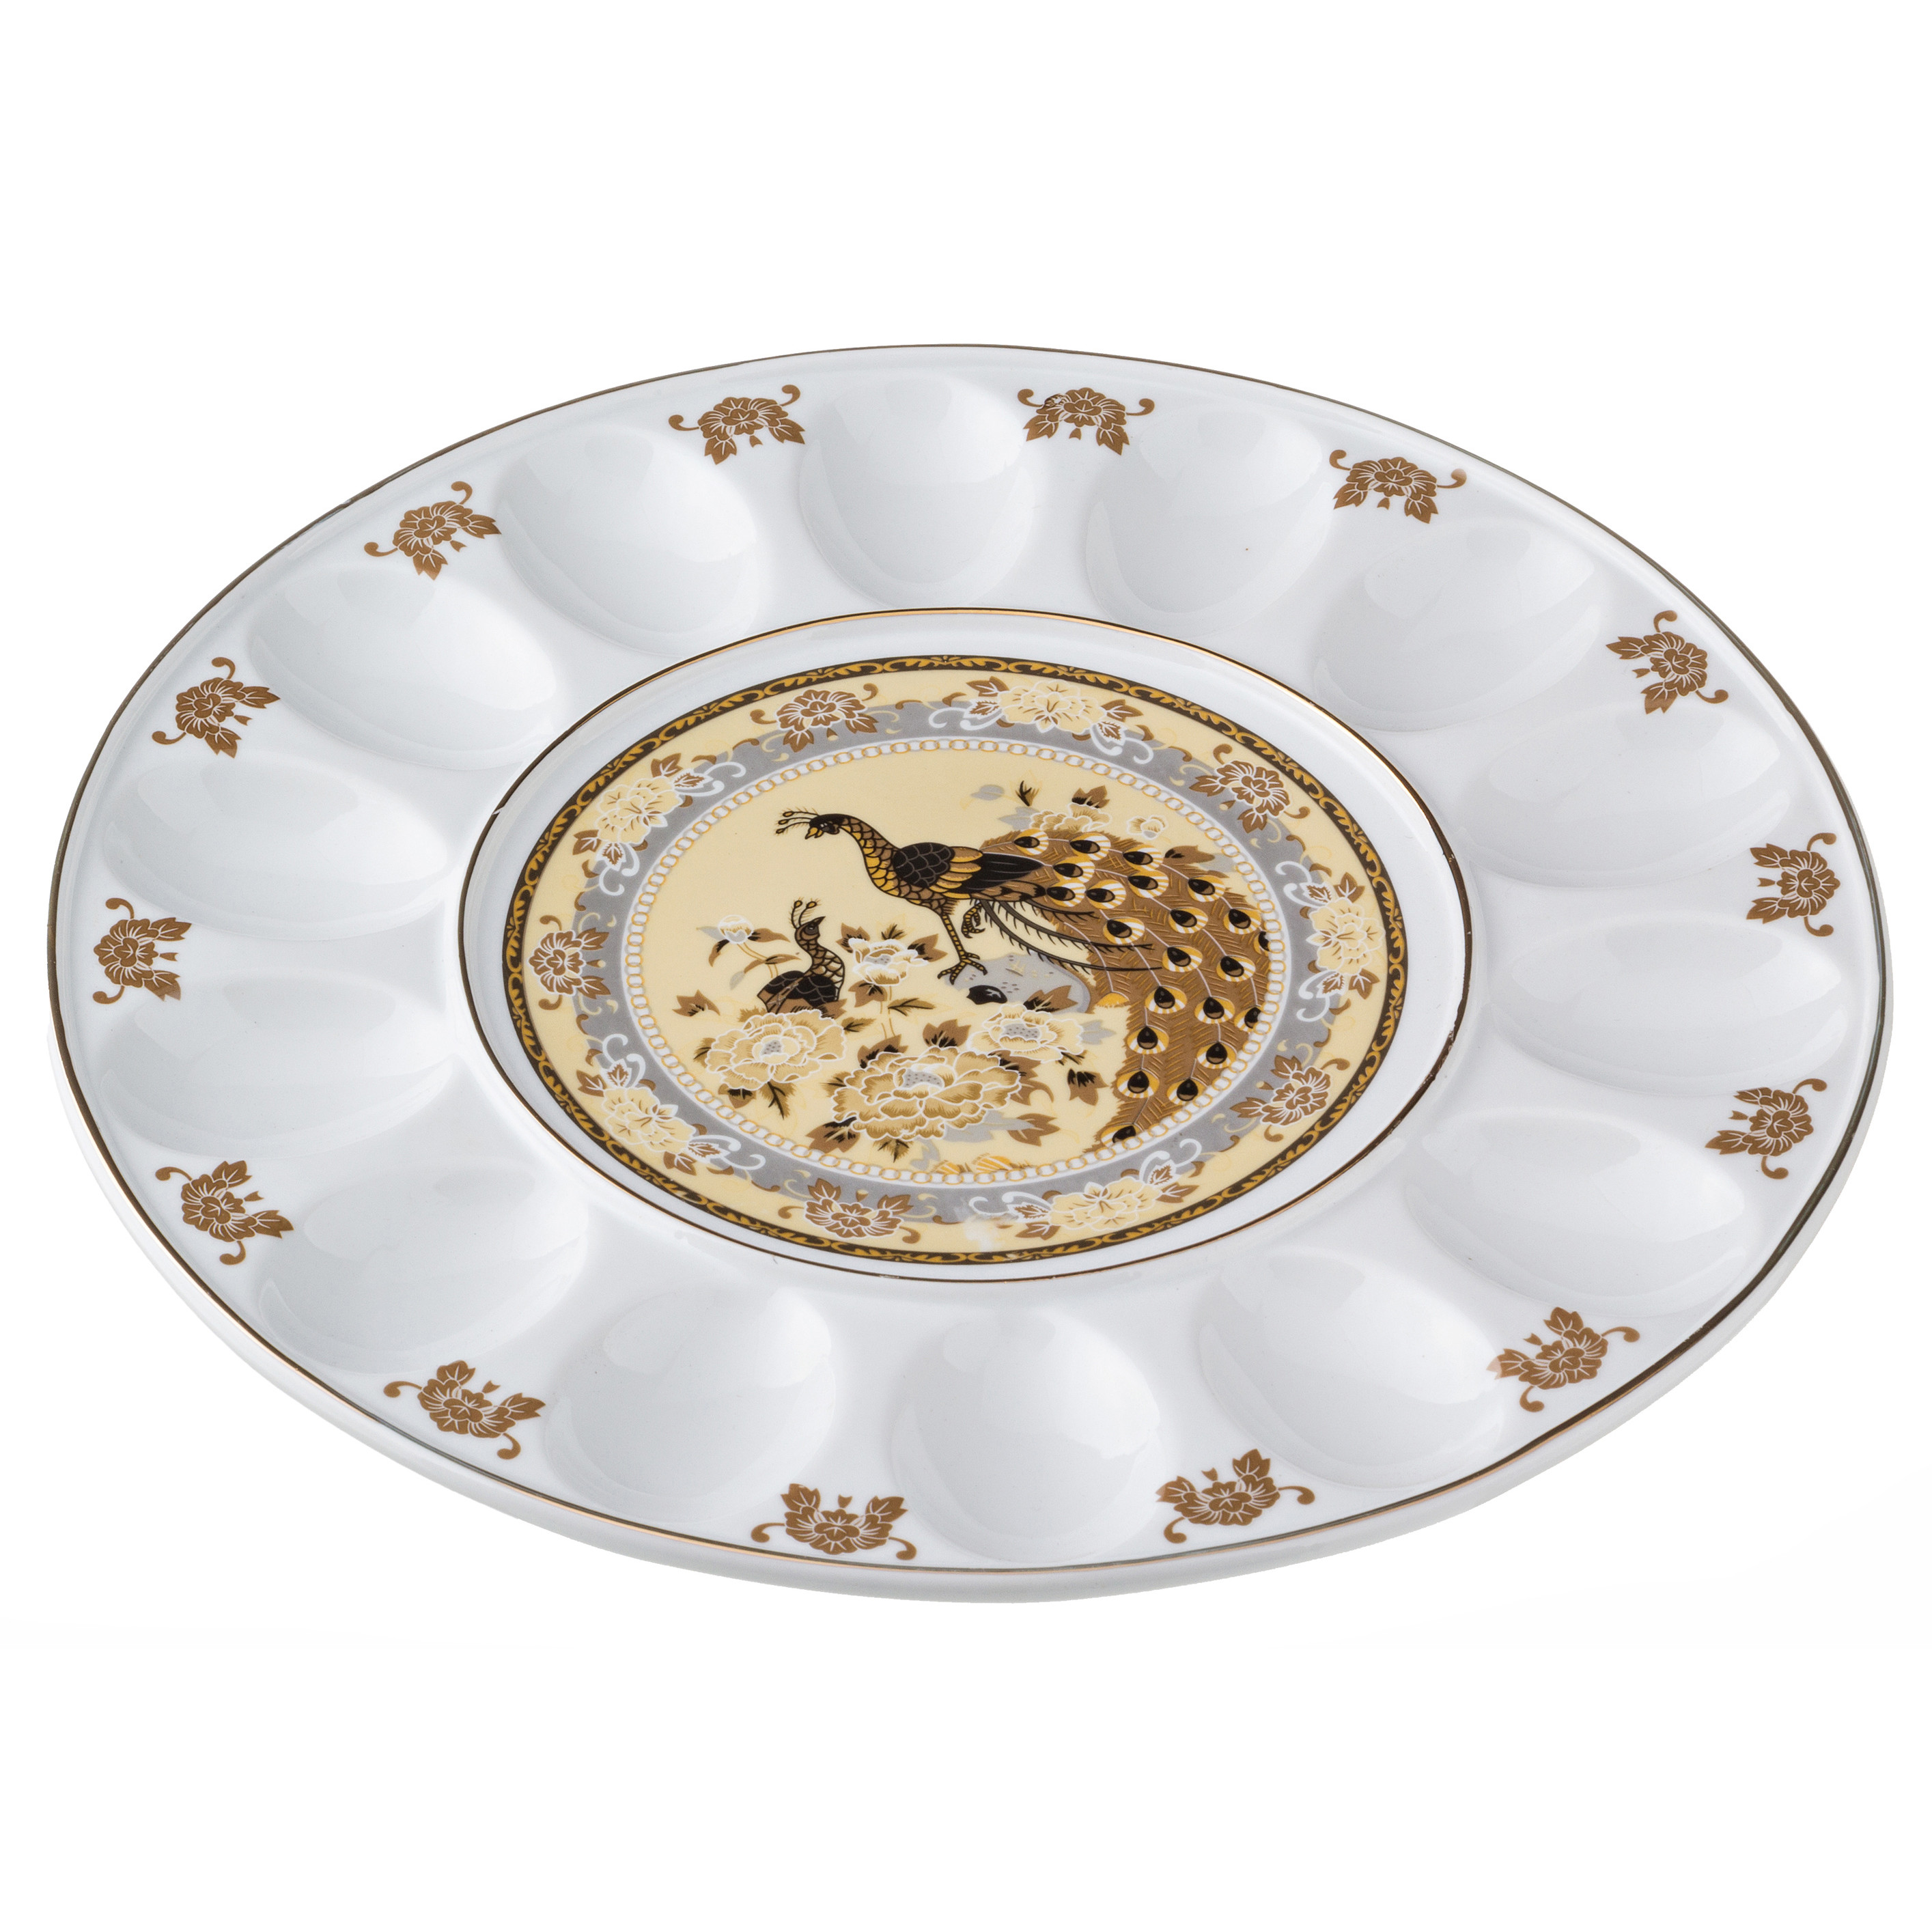 {} Arti-M Тарелка для яиц Бежевый Павлин (2х30 см)